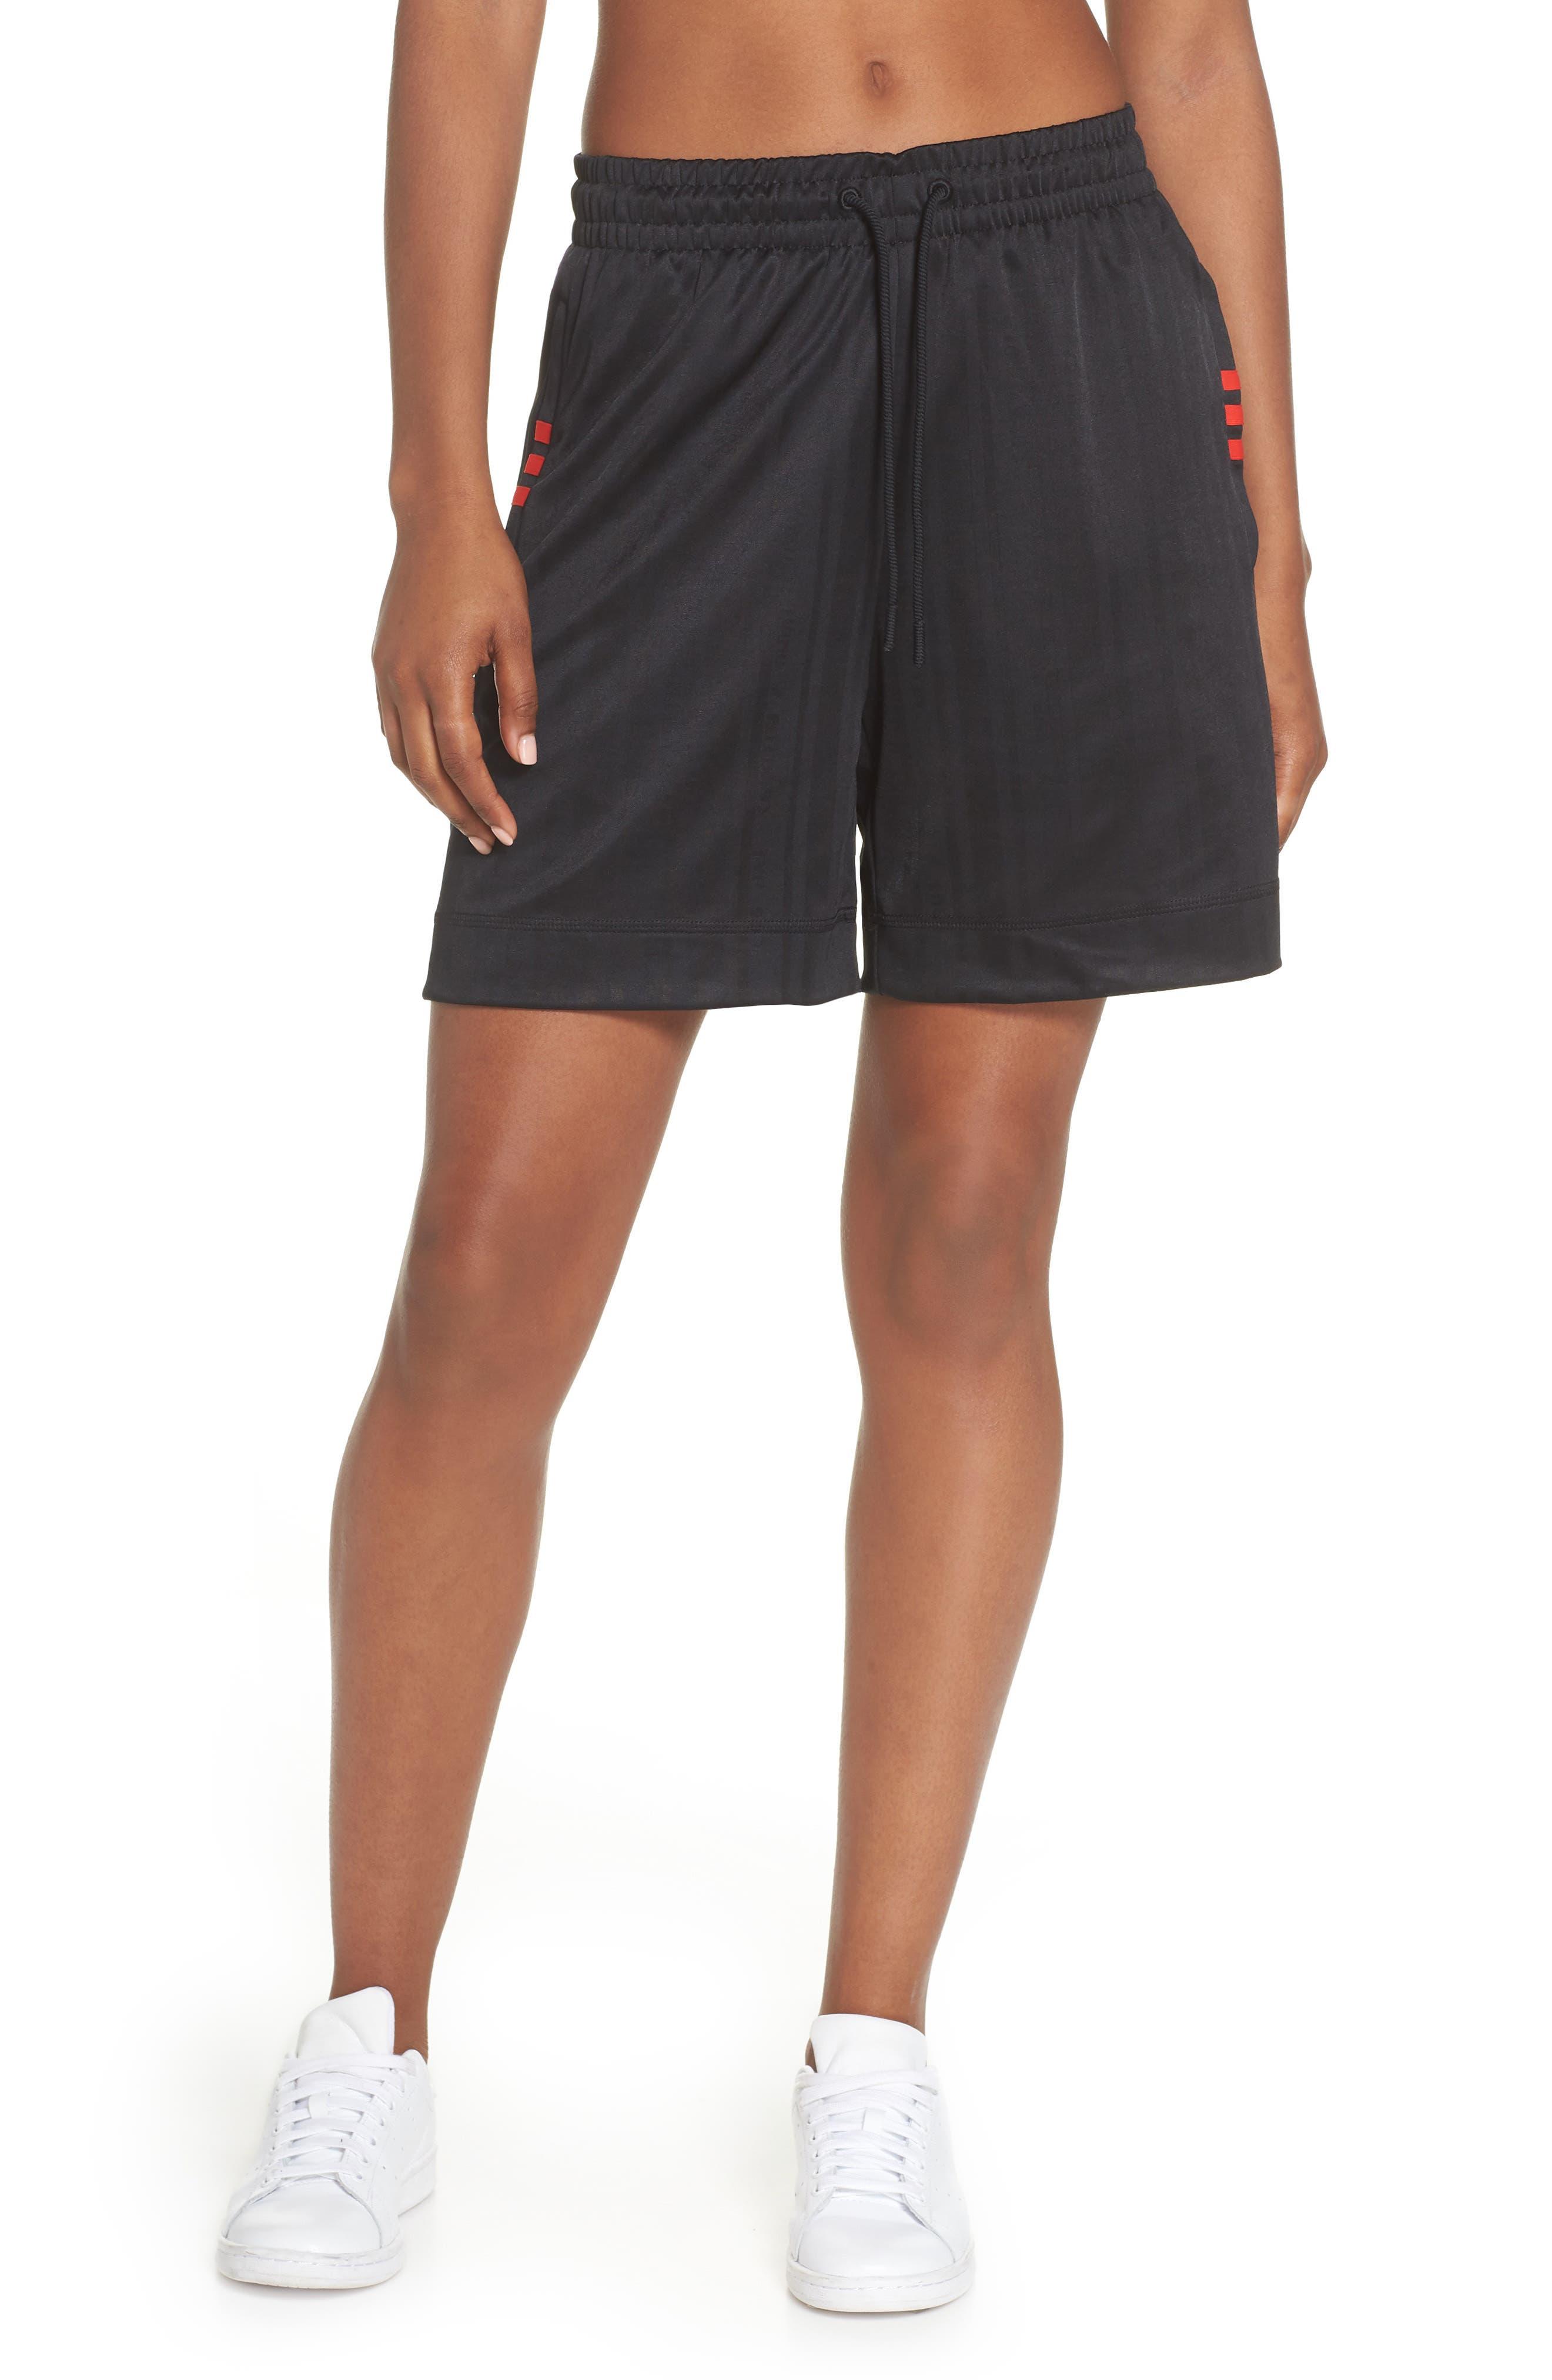 Soccer Shorts,                             Main thumbnail 1, color,                             Black/ Core Red